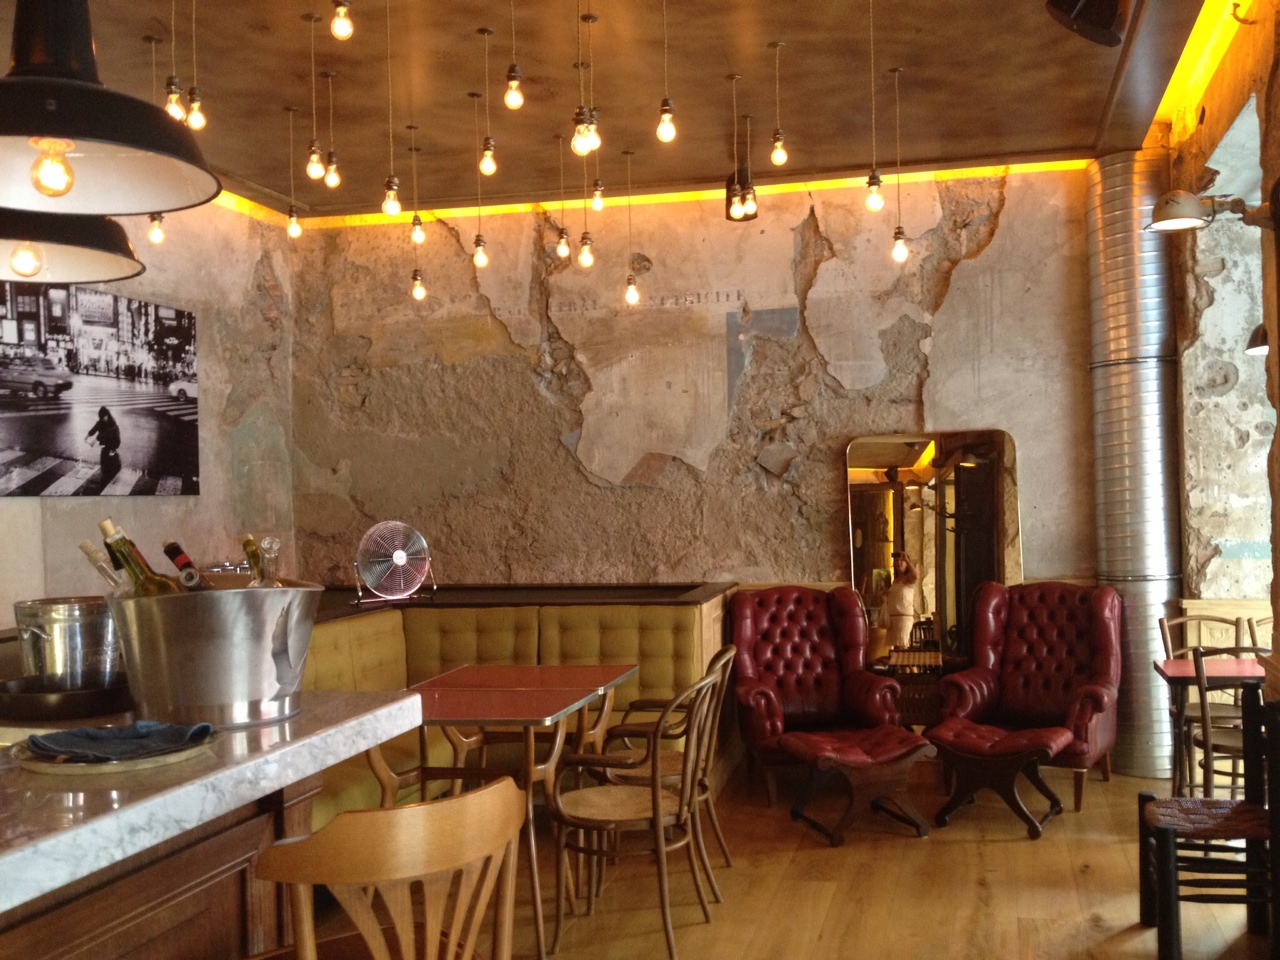 Nouveau bar tester nice le comptoir central electrique street balades - Bar le central ...